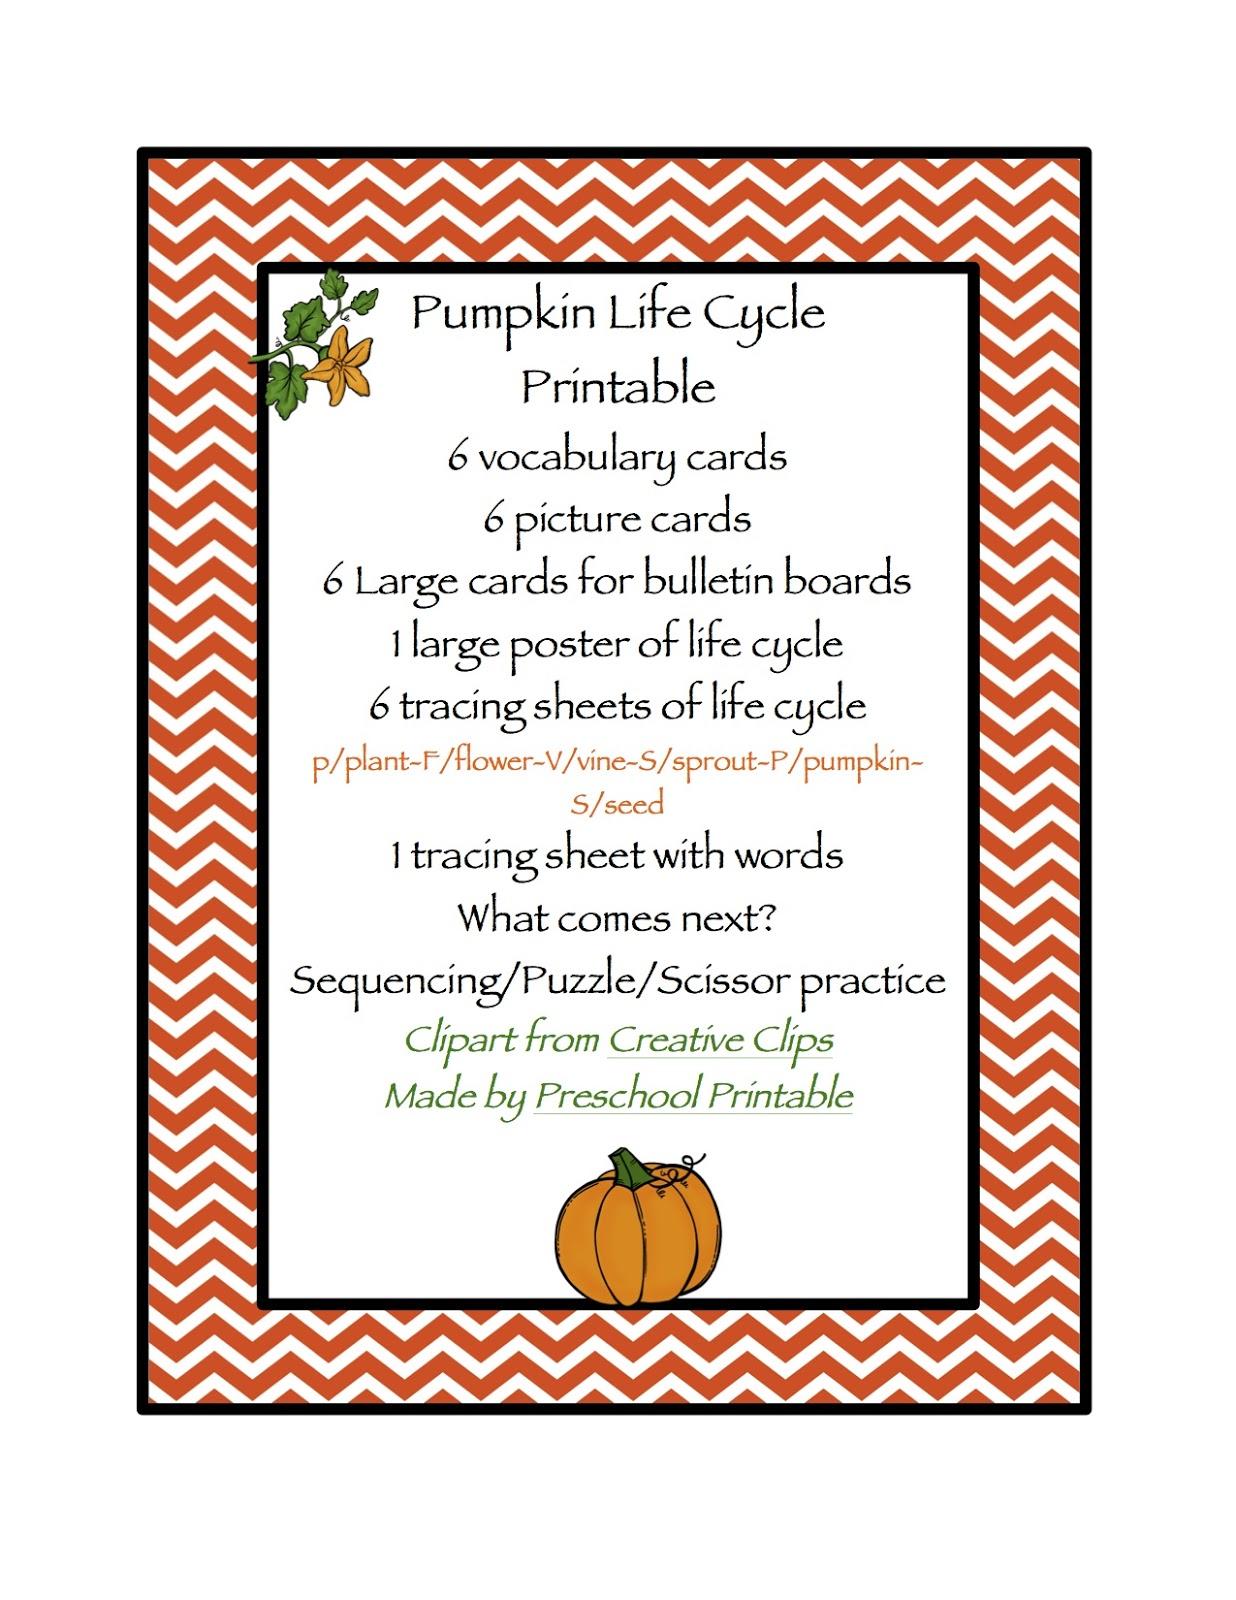 Pumpkin Life Cycle Printable Preschool Printables